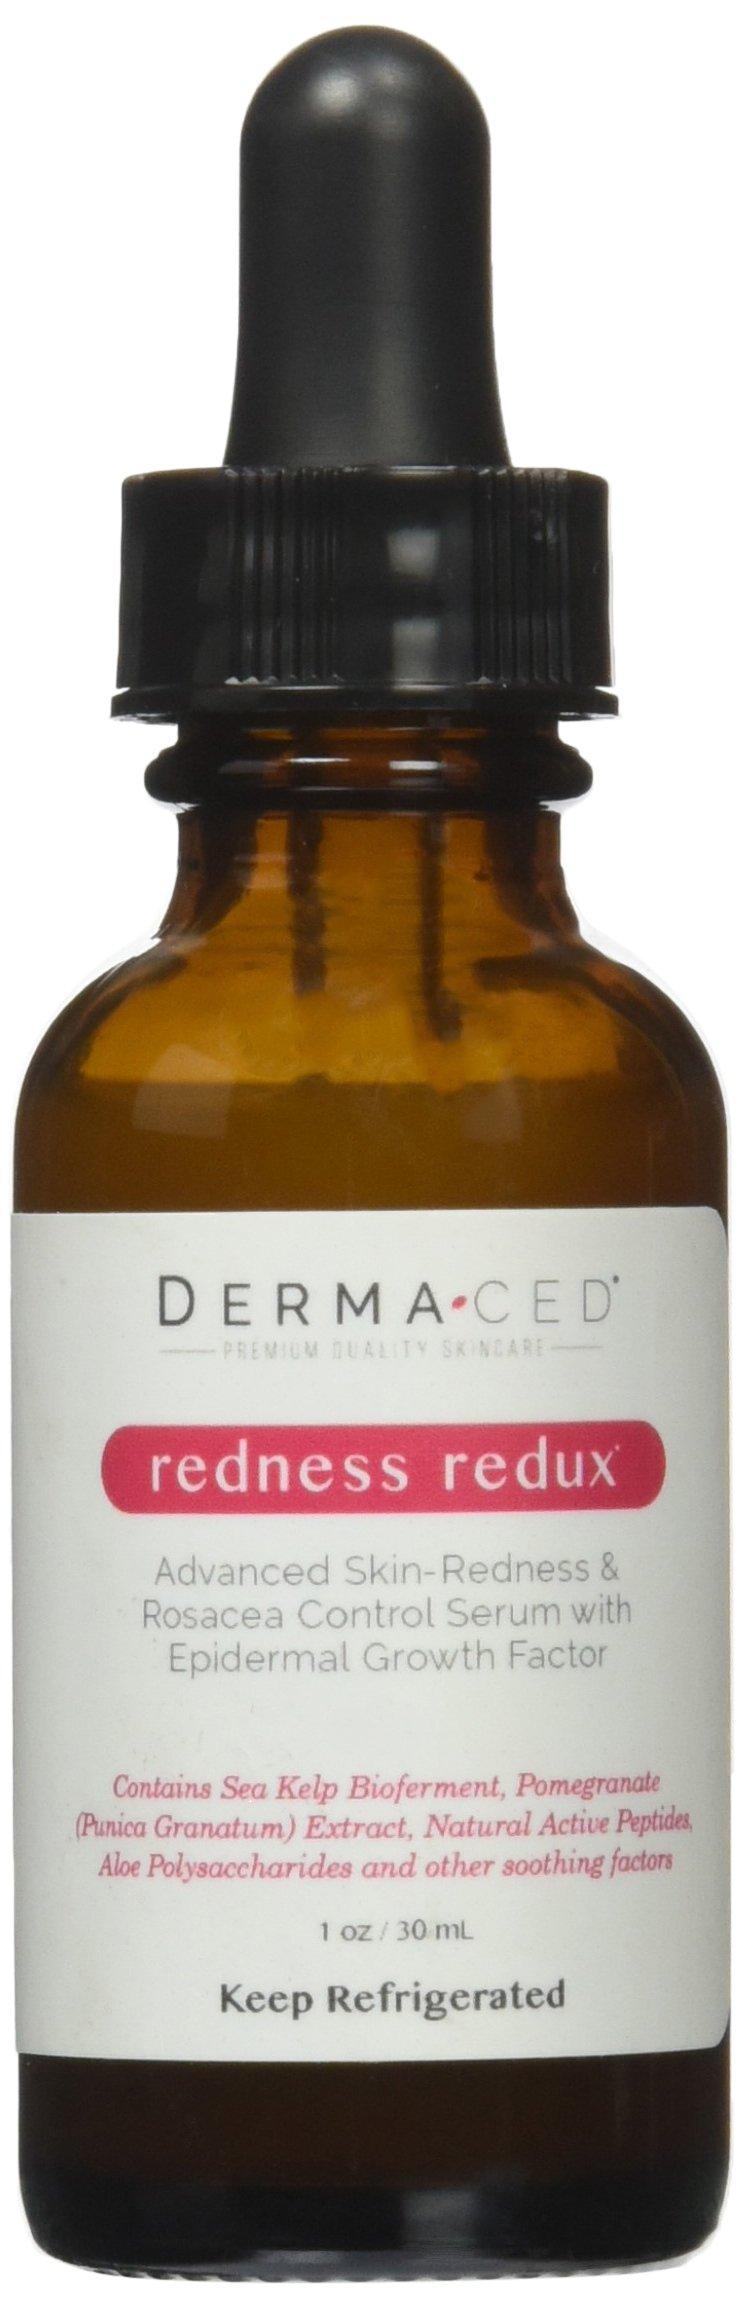 Dermaced Redness Redux Advanced Rosacea